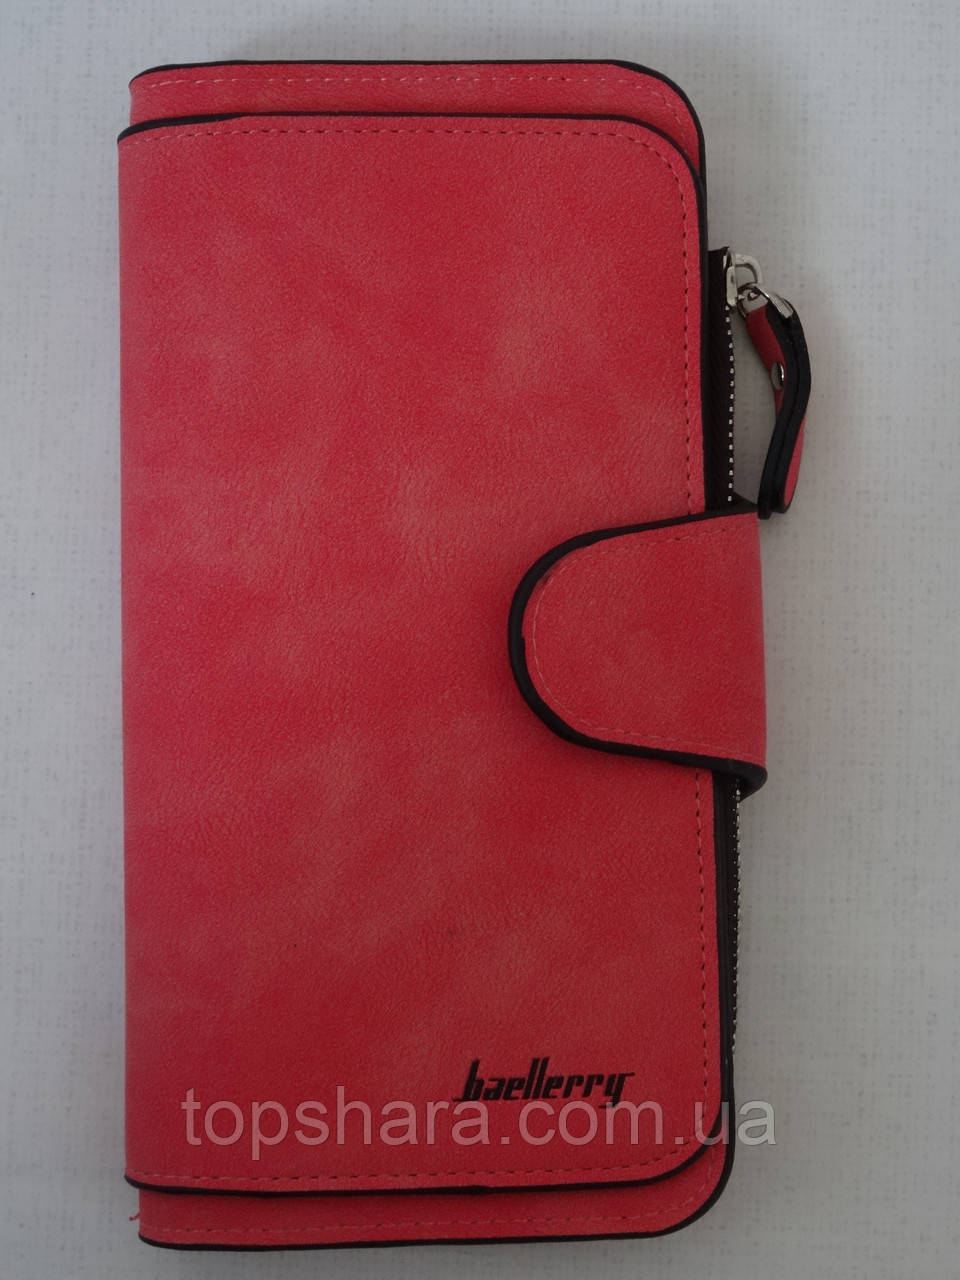 Женский кошелек клатч портмоне гаманець Baellerry Forever 2345 night red